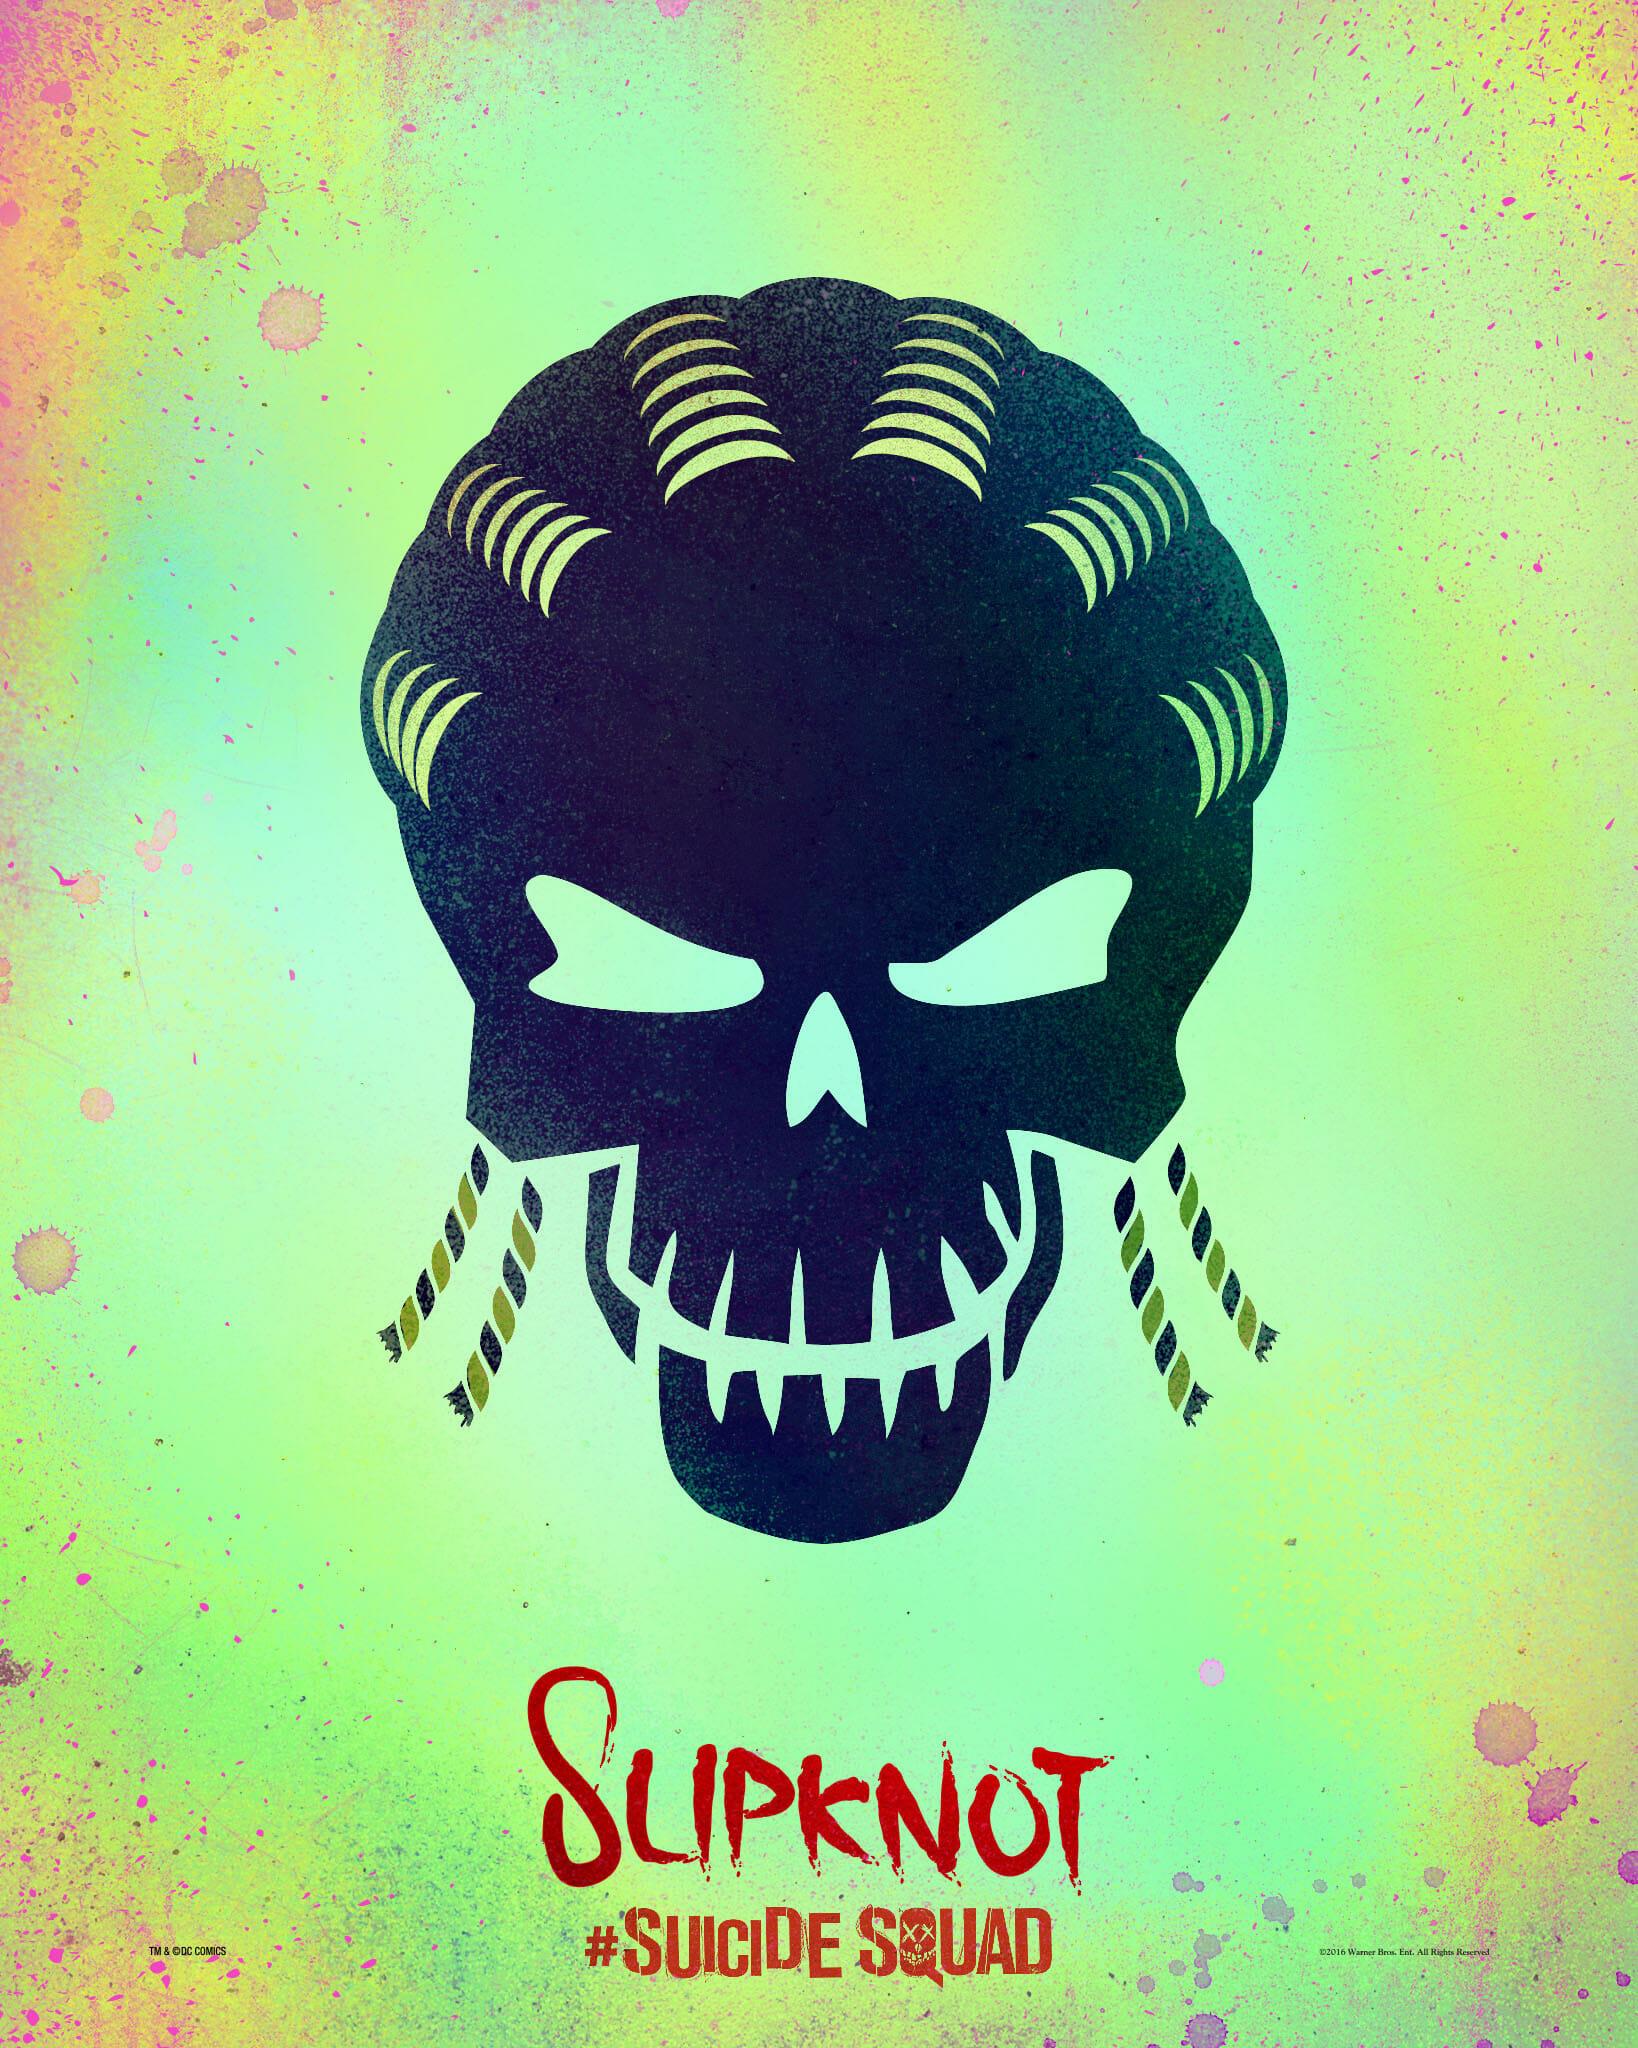 SUISQ_Skull_Slipknot_Instagram_1638x2048_master